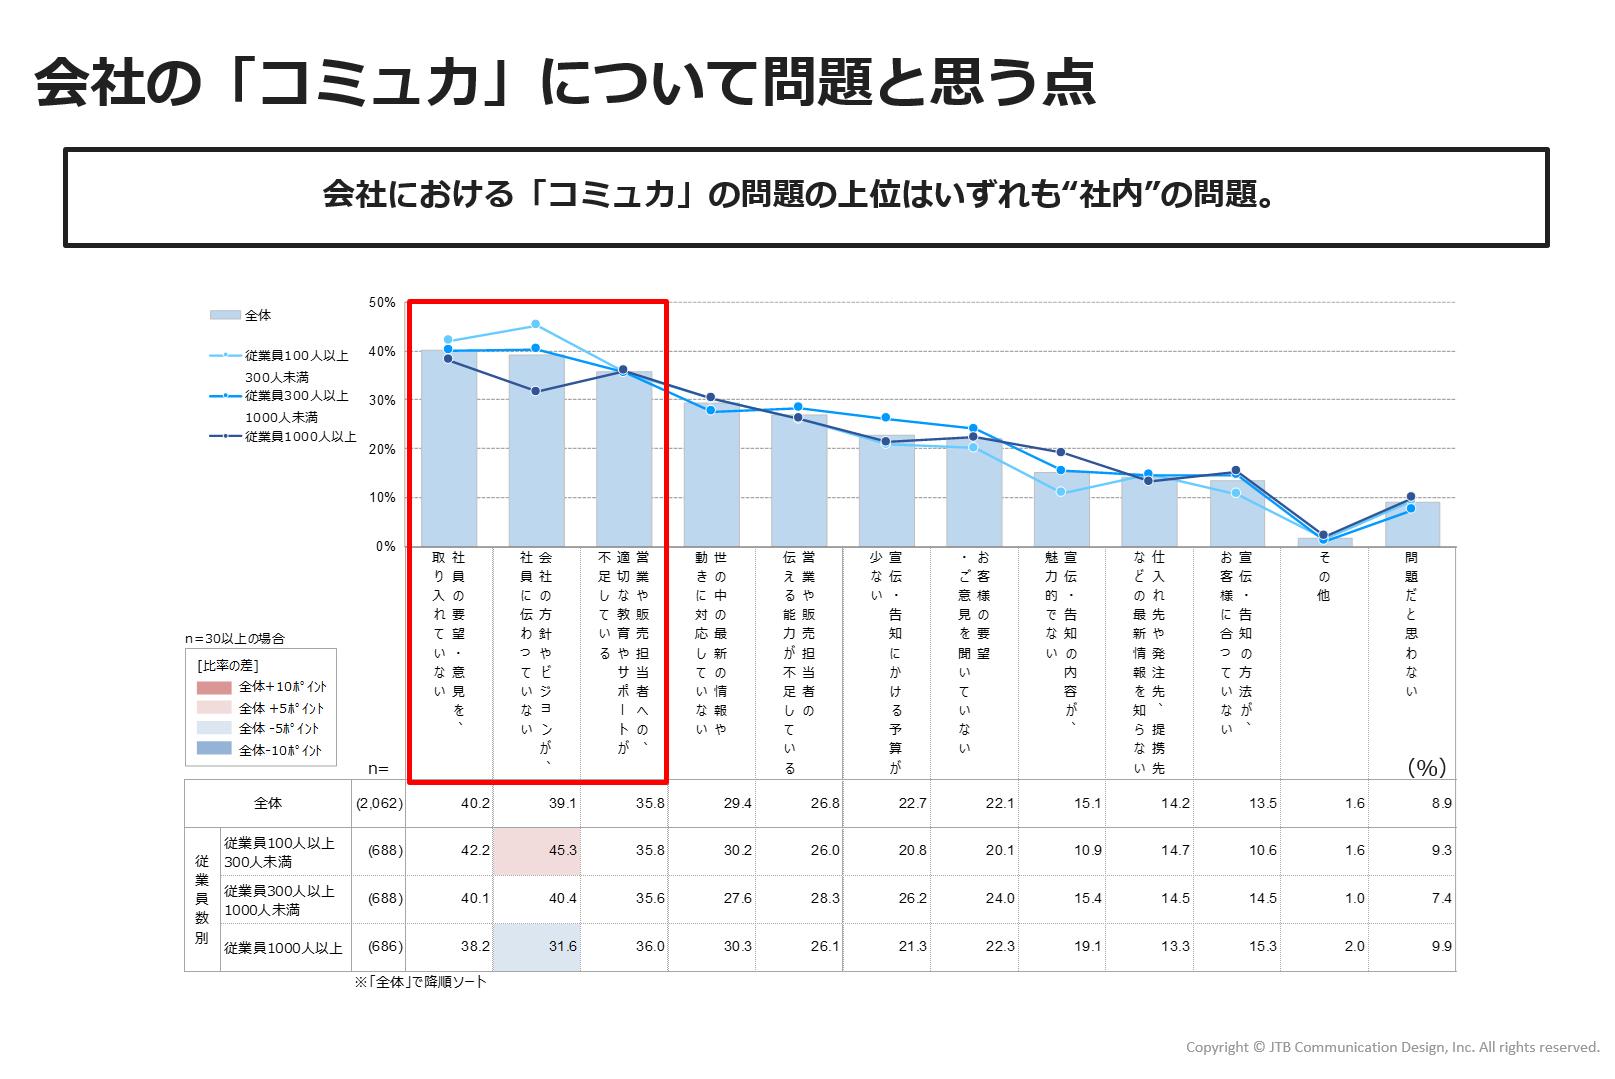 https://www.jtbcom.co.jp/article/img/commu-figure7.png